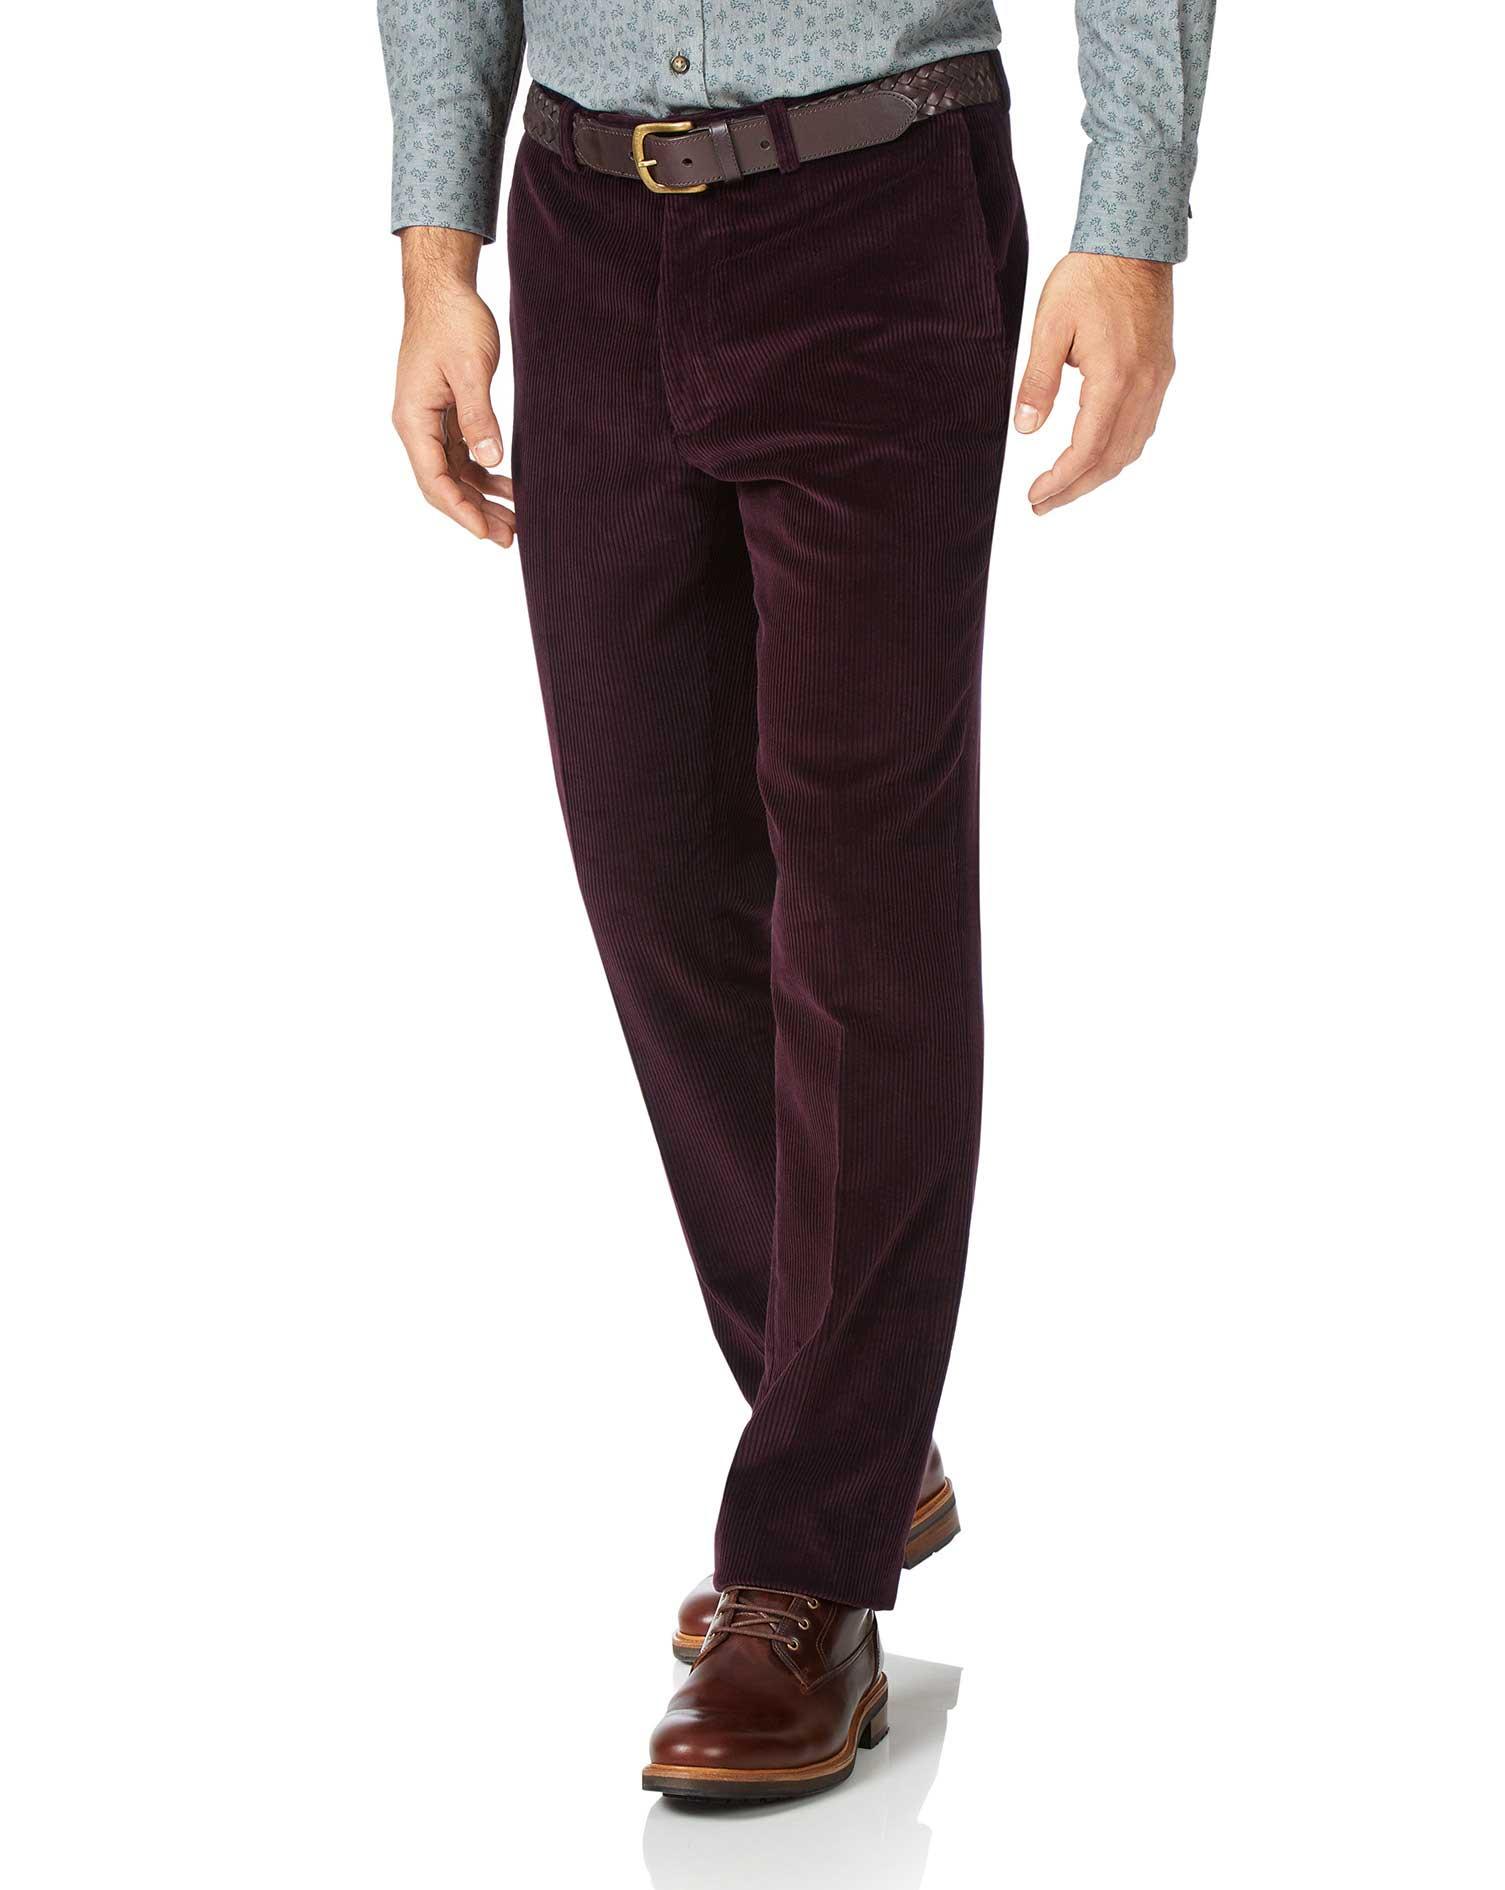 Wine Slim Fit Jumbo Corduroy Trousers Size W32 L34 by Charles Tyrwhitt